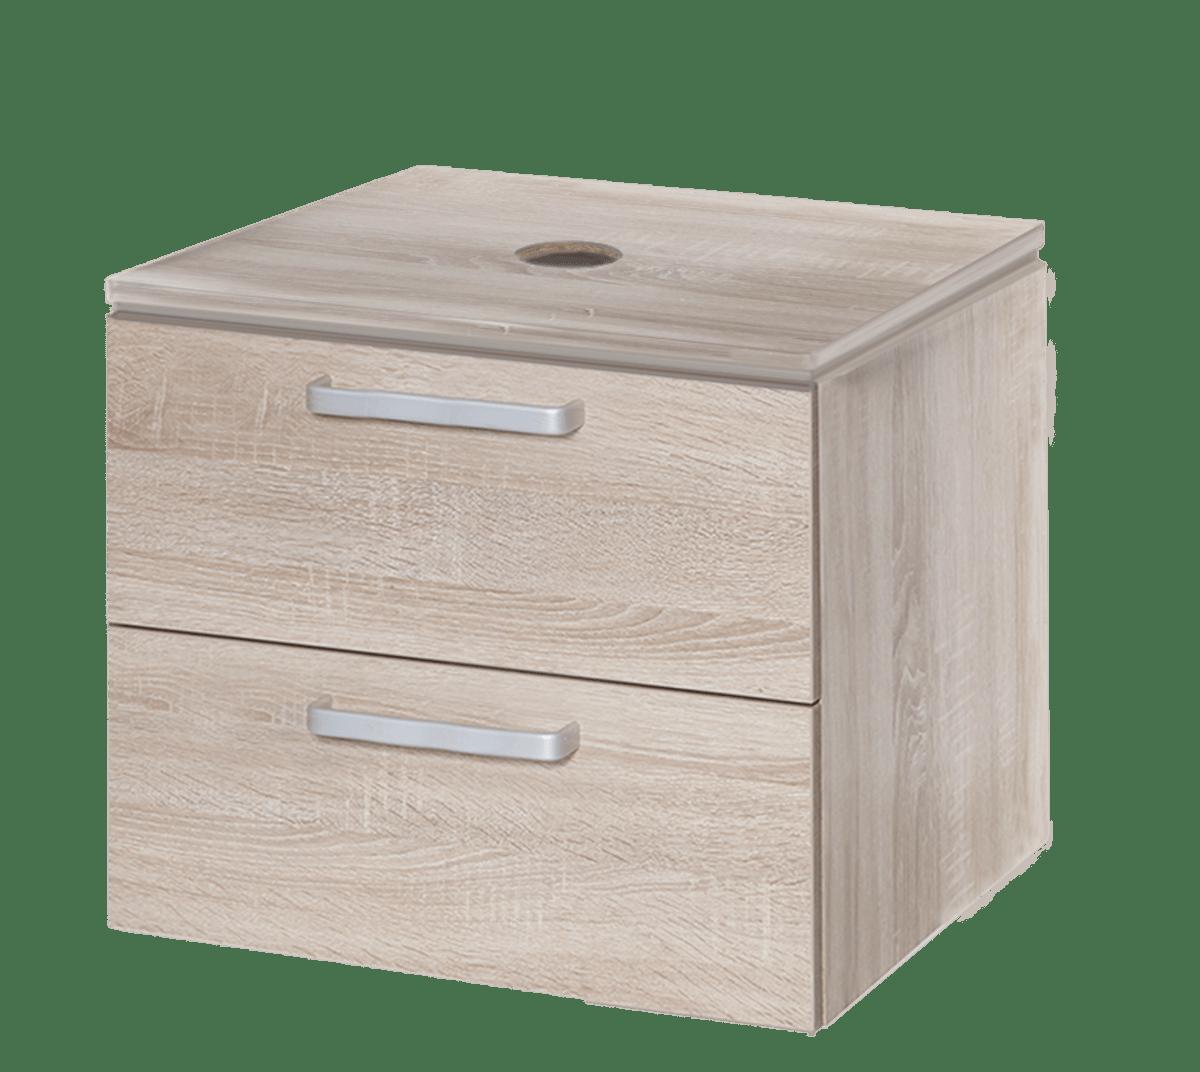 Koupelnová skříňka pod umyvadlo Naturel Vario Dekor 54x45 cm dub bardolino VARIODESK60ZDBDB